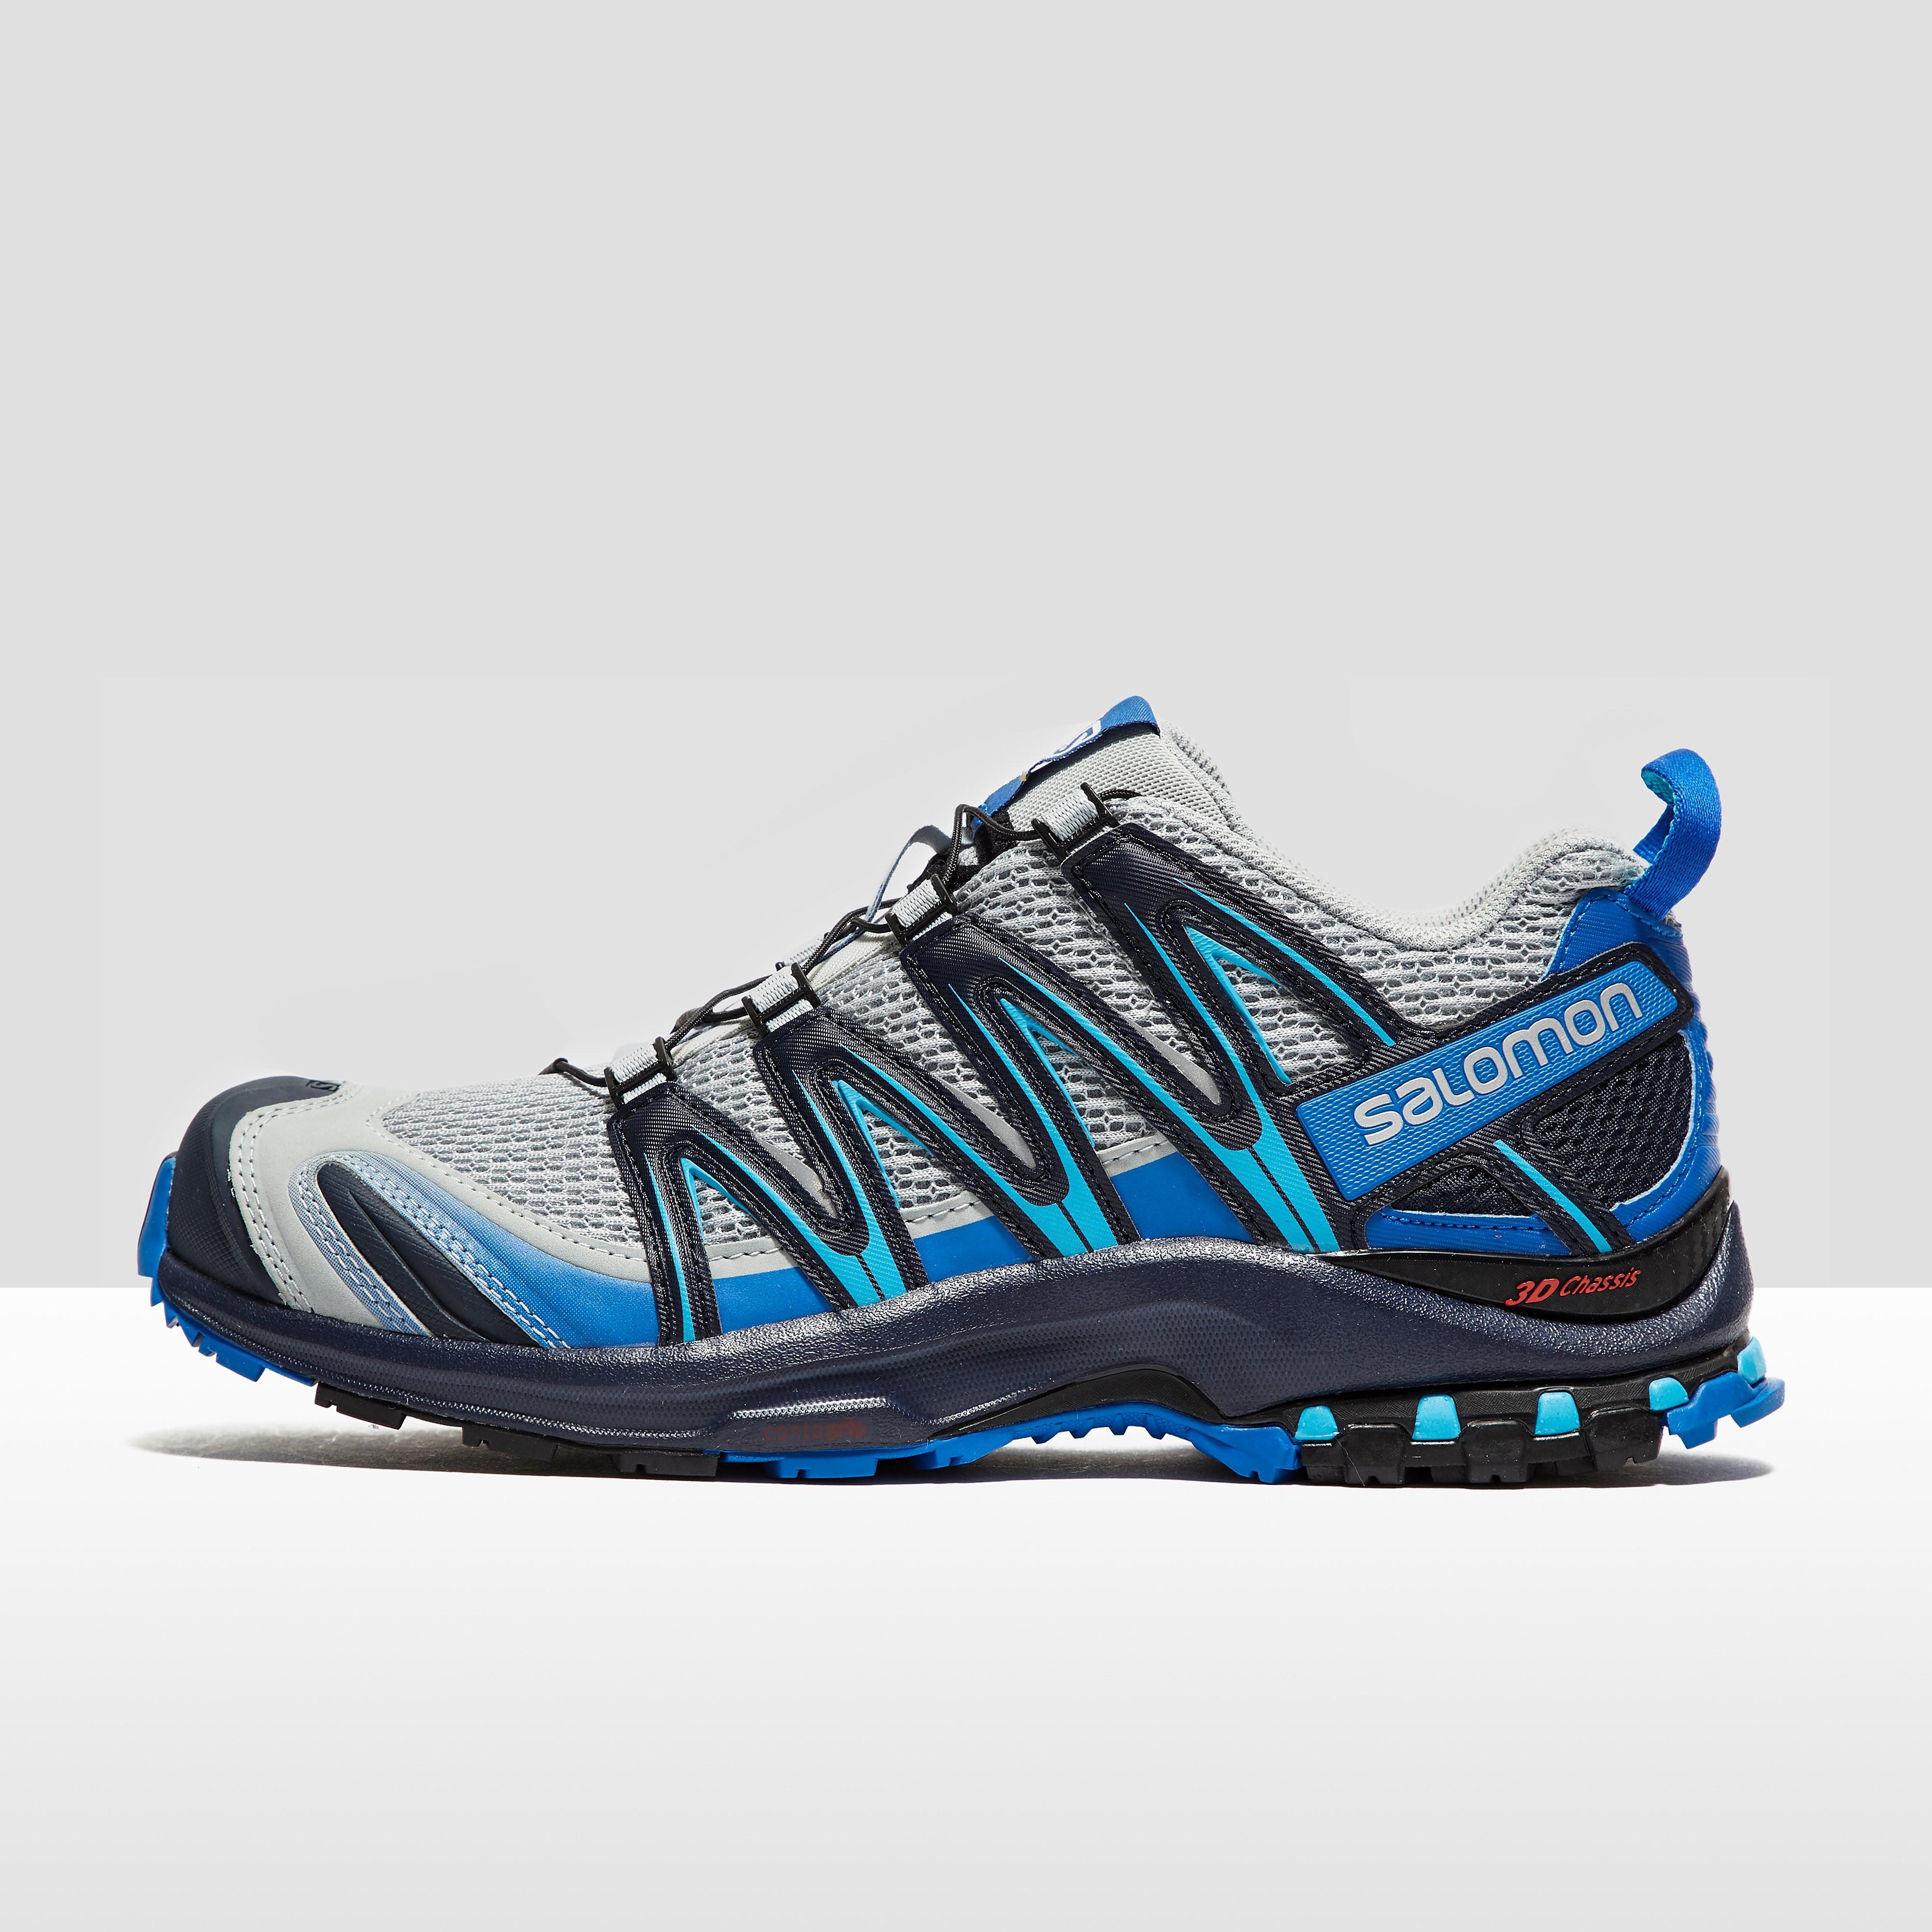 Salomon XA Pro 3D Men's Trail Running Shoes